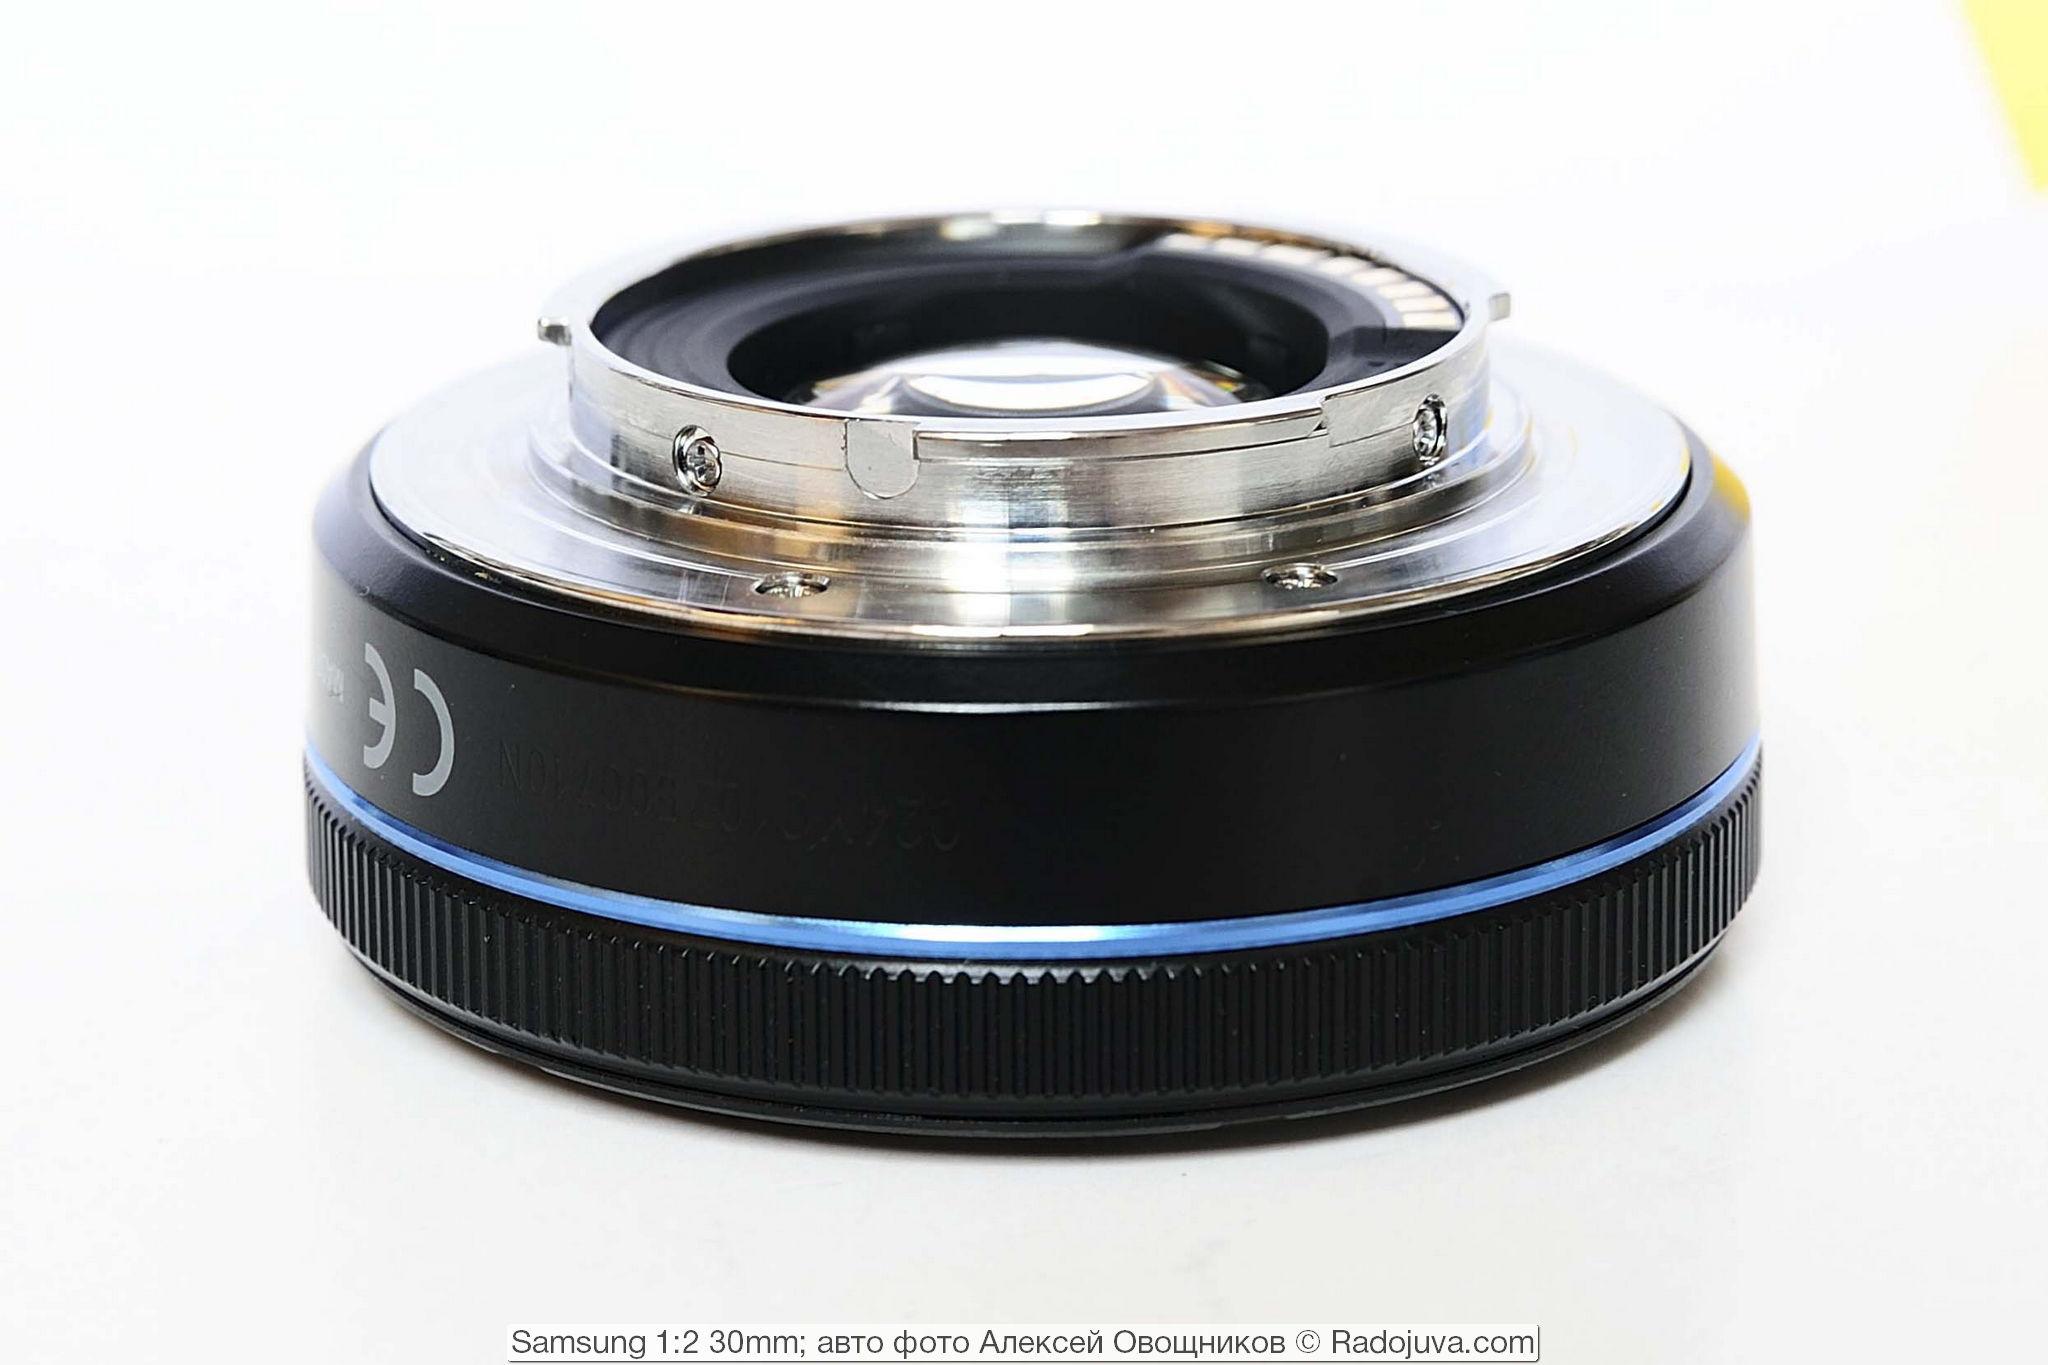 Samsung 1:2 30mm